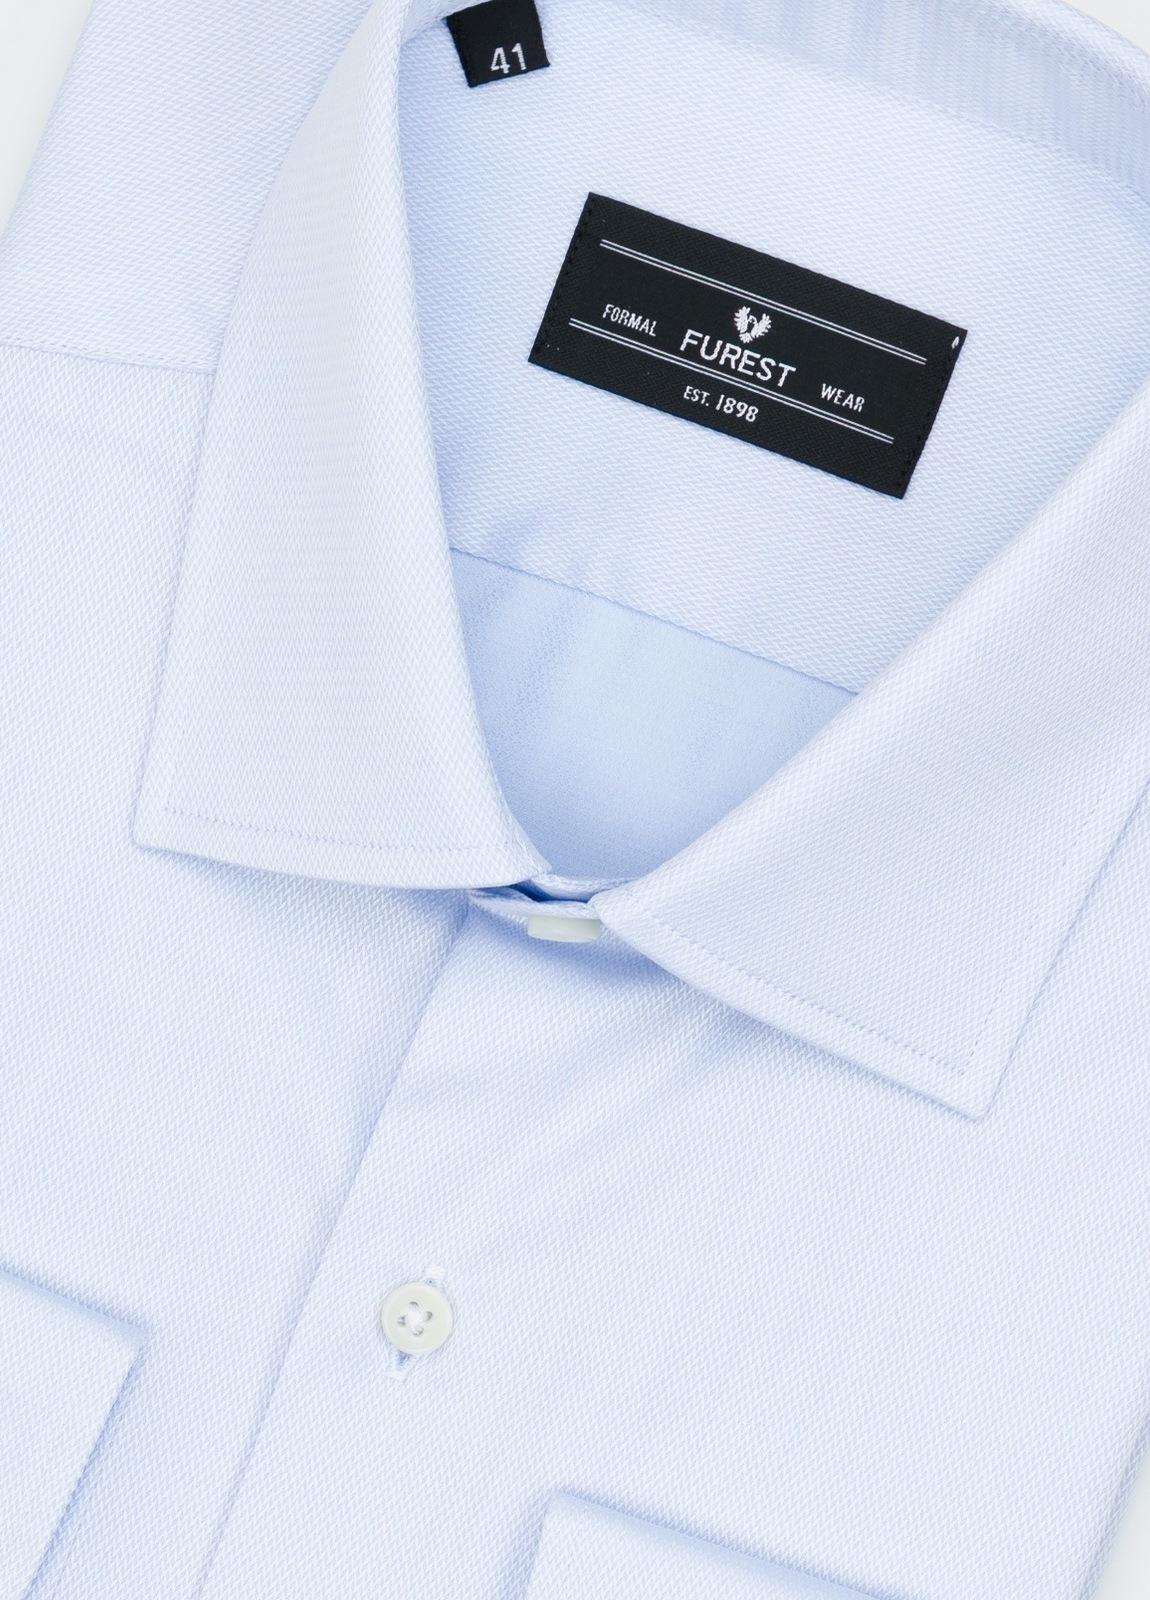 Camisa Formal Wear SLIM FIT cuello italiano modelo ROMA microtextura color celeste, 100% Algodón. - Ítem2